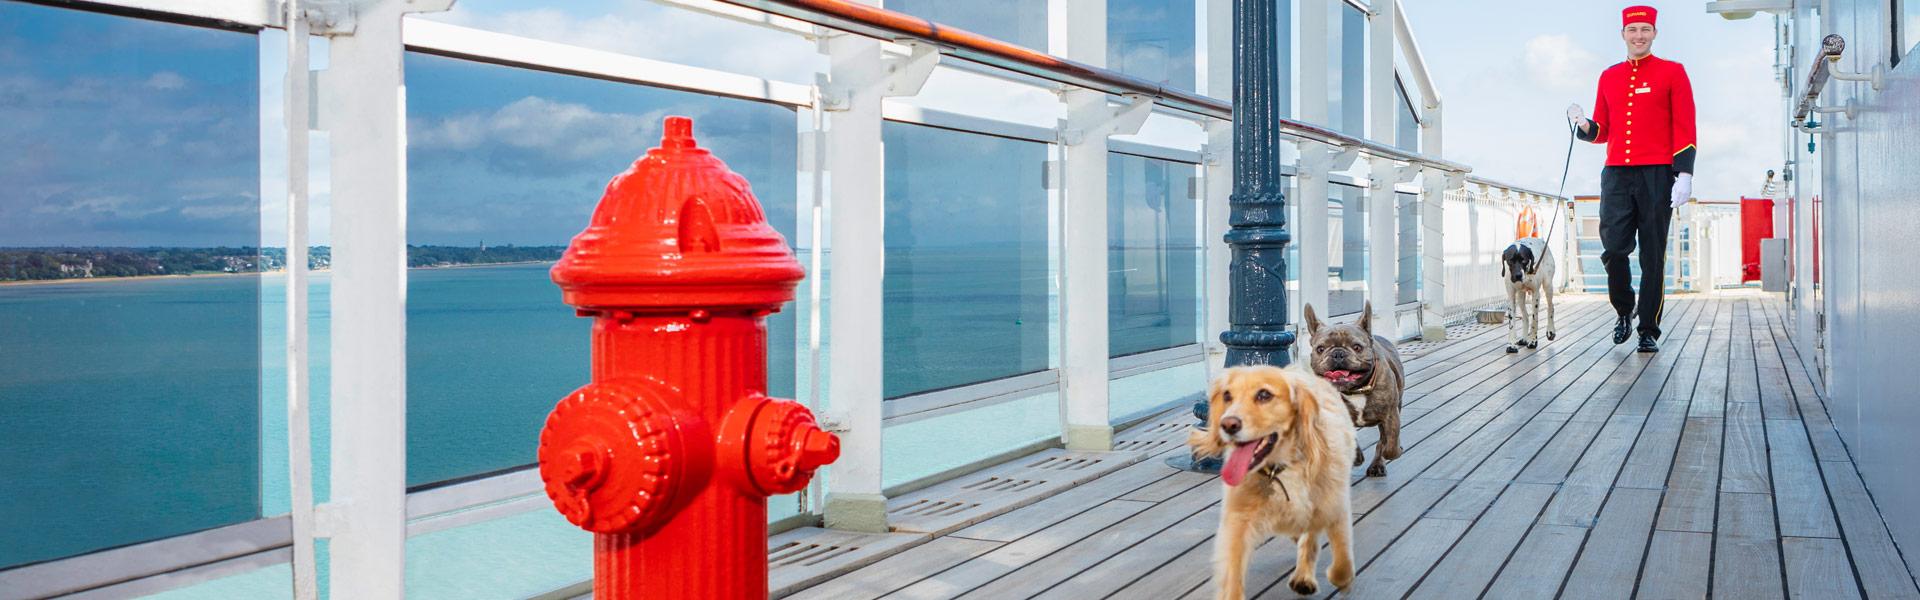 Do cruise ships allow dogs?